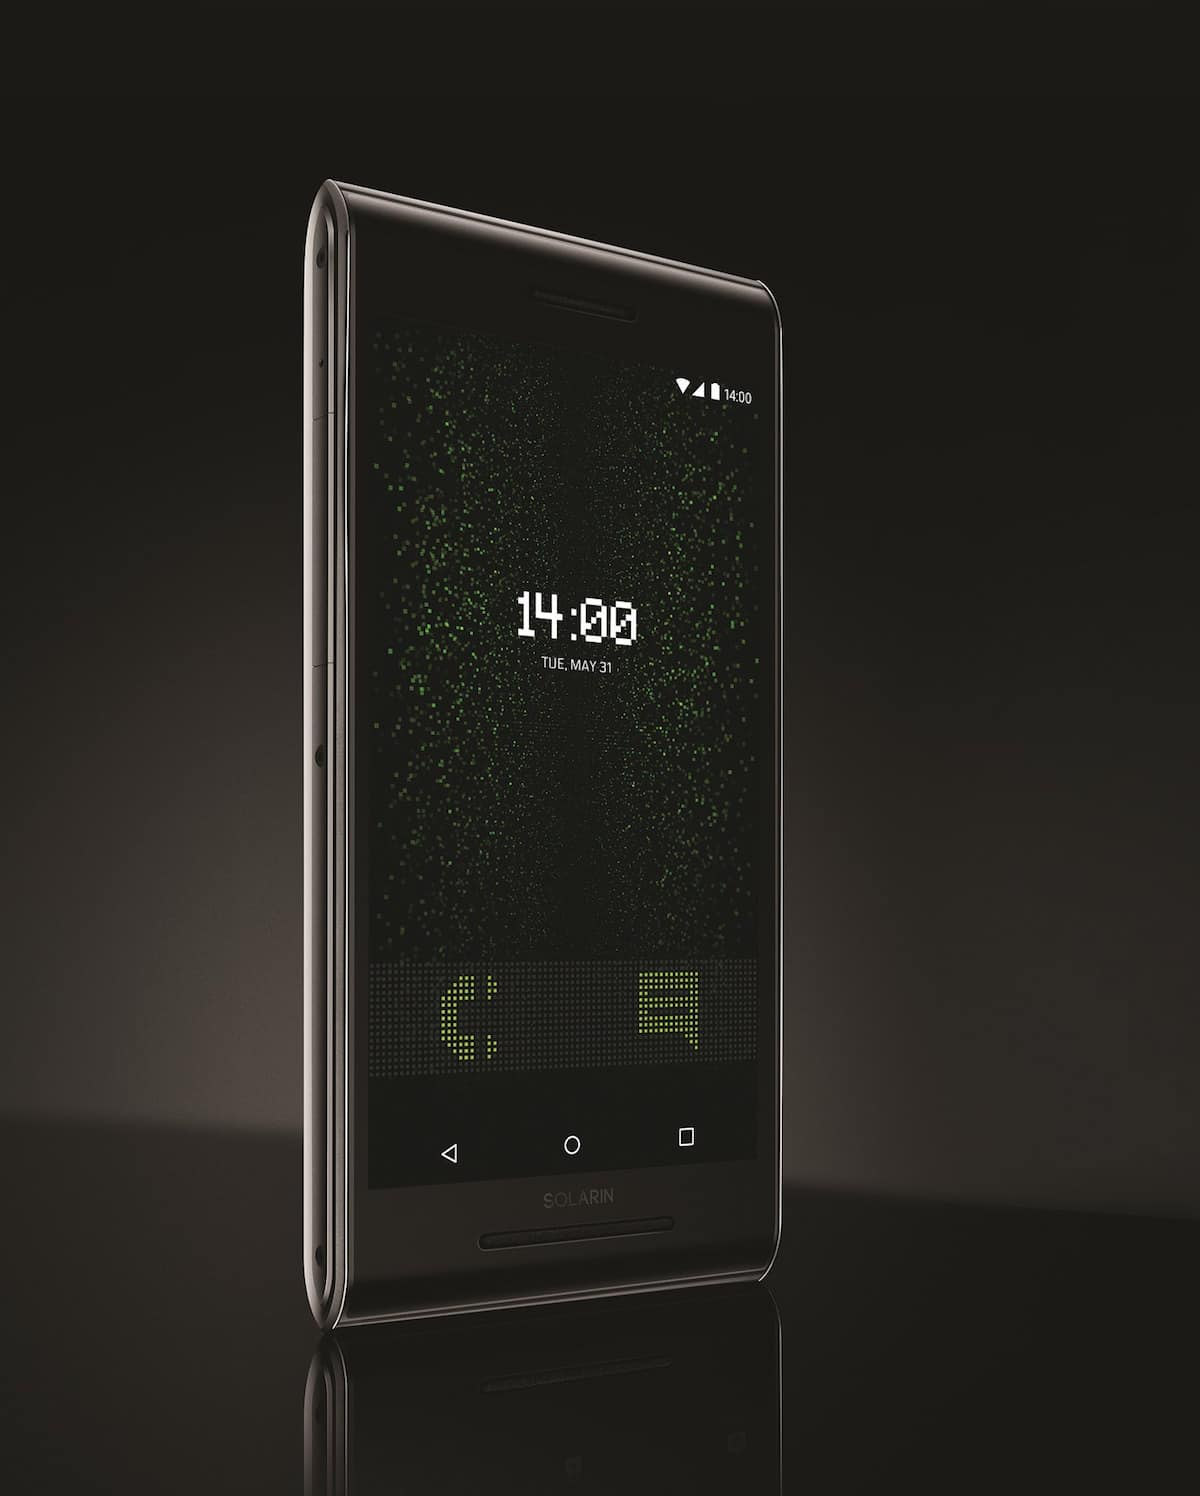 Solarin-smartphone-5